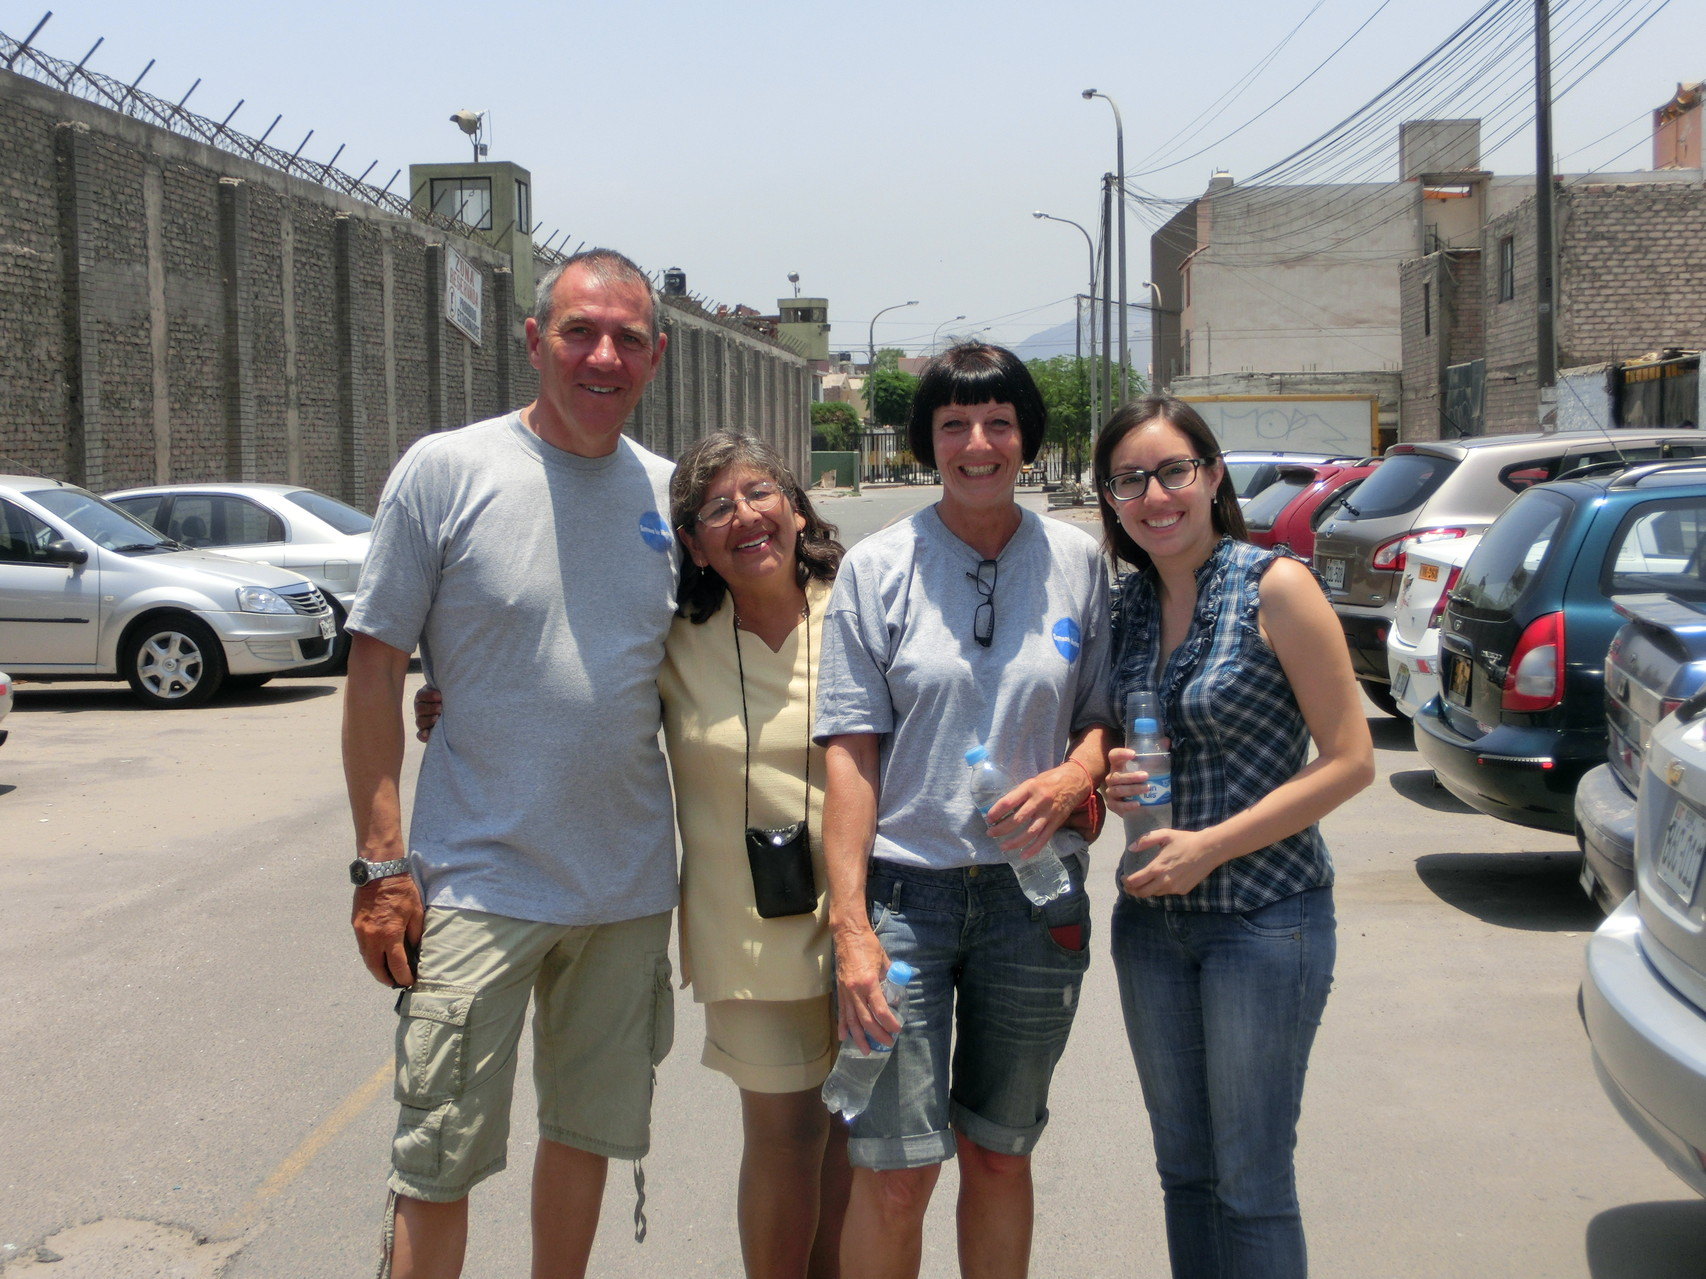 Alf, Anita, Rosi und Sandra